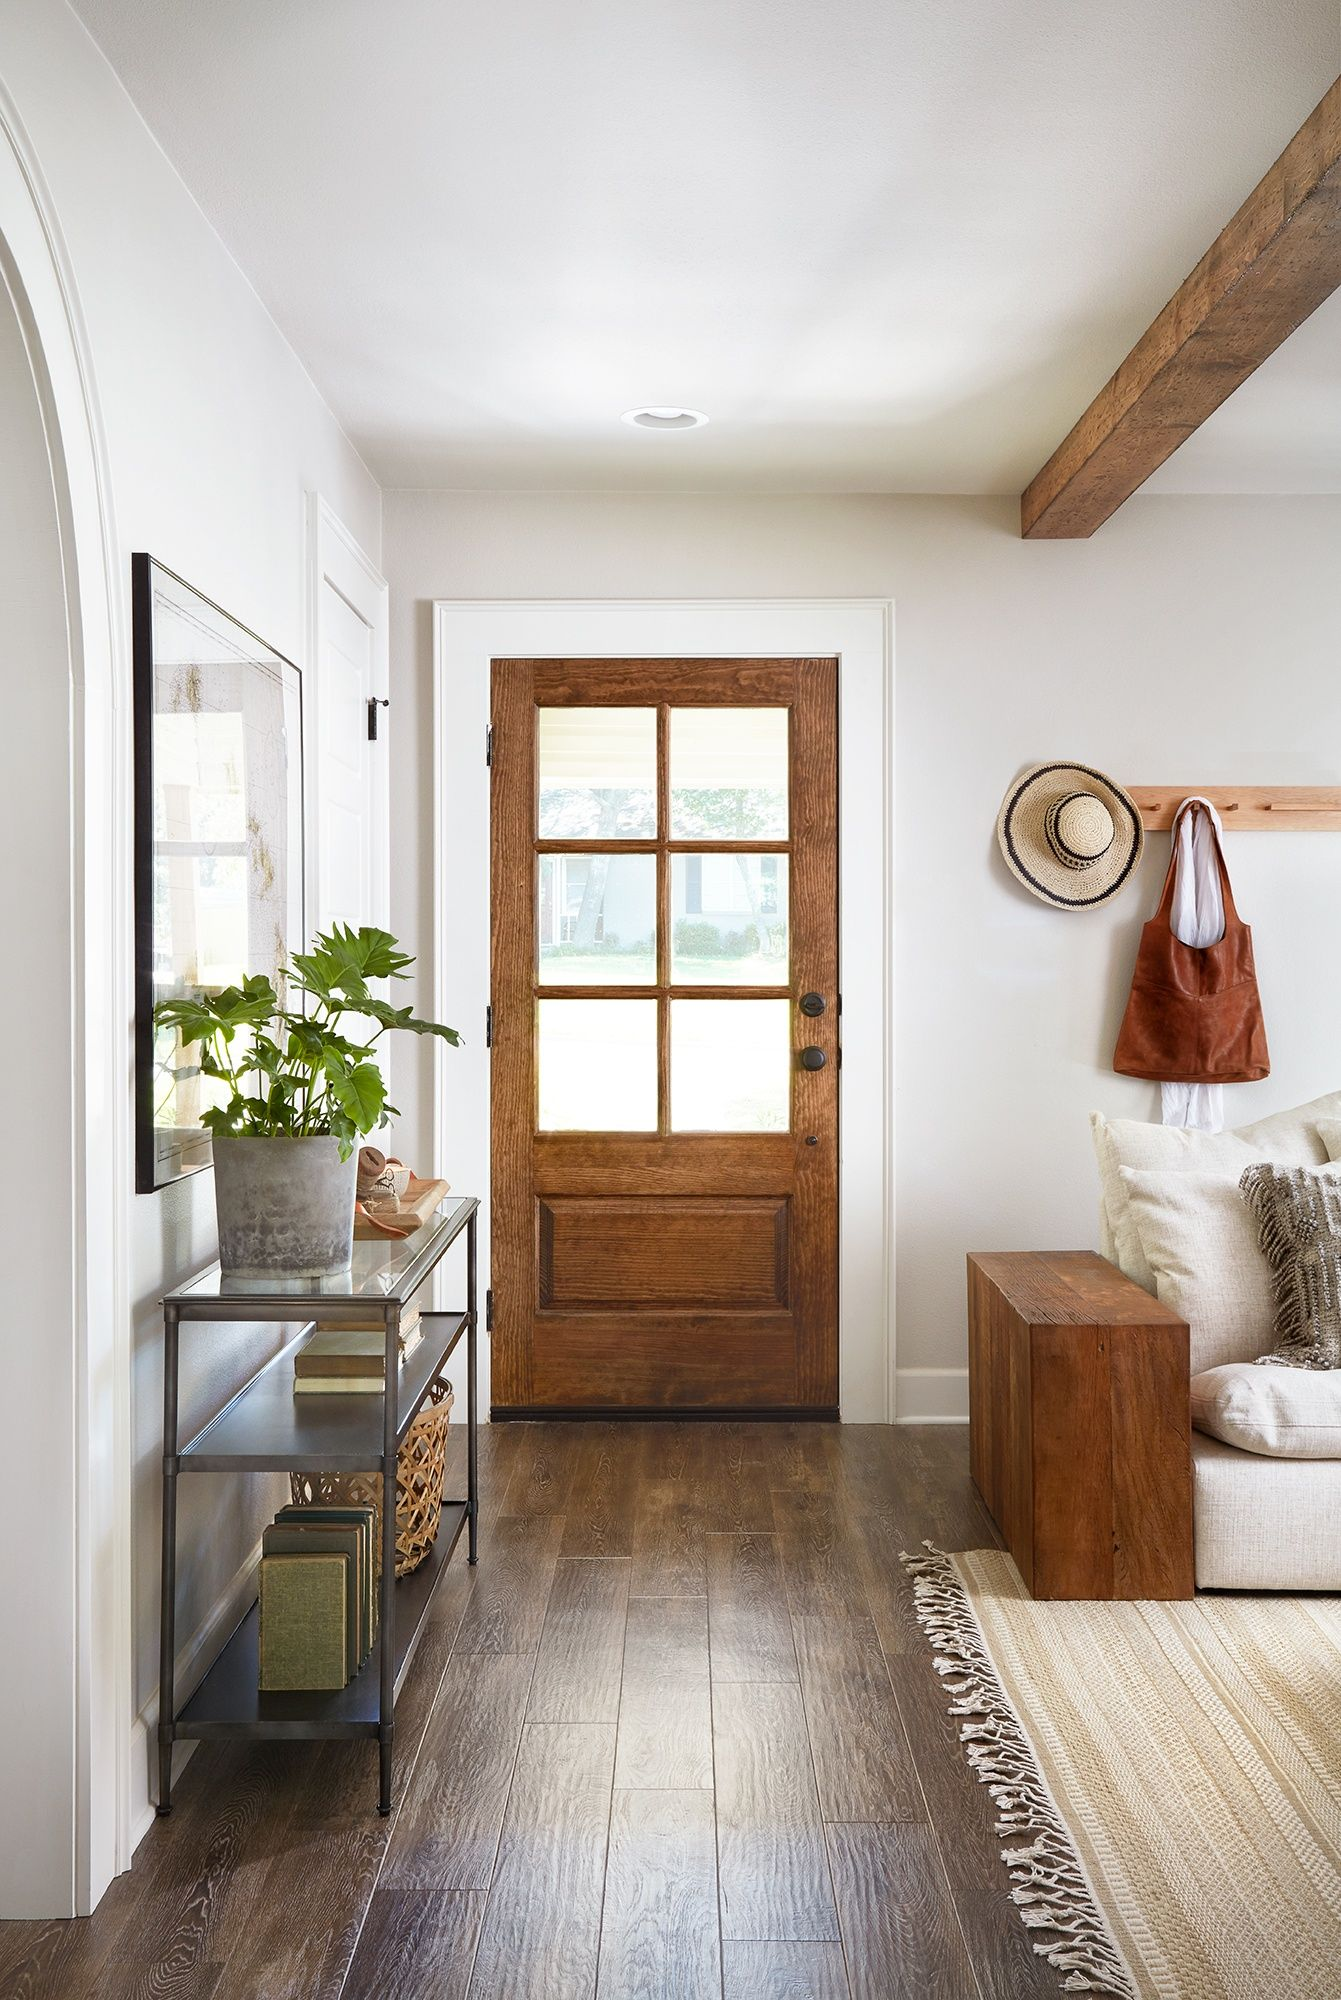 Joanna gaines hallway decor  Episode  Season   Decorating Ideas  Pinterest  Fixer upper